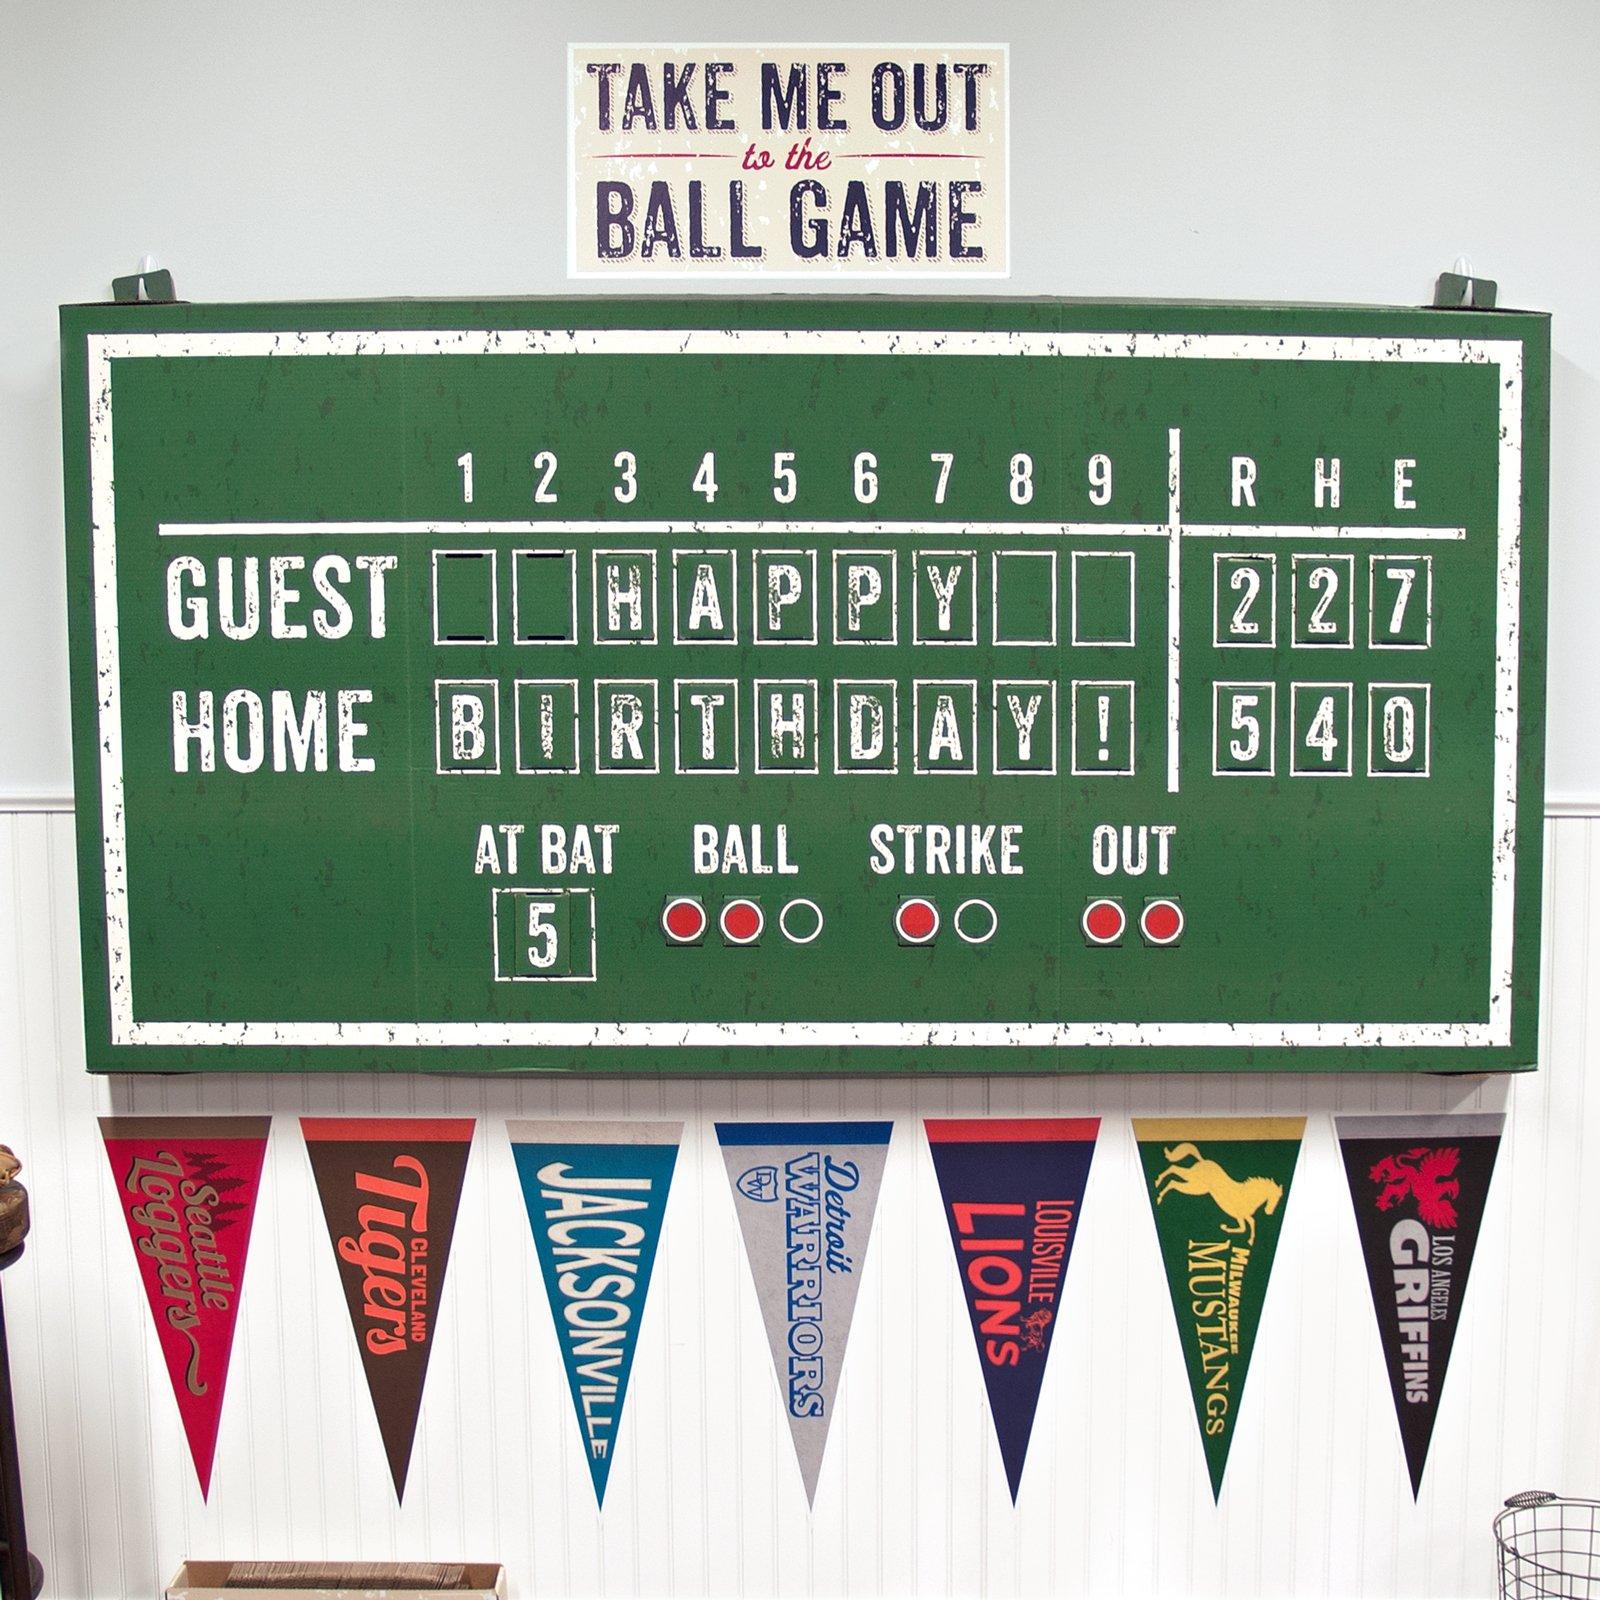 Baseball Time Party Supplies - Hanging Scoreboard by BirthdayExpress